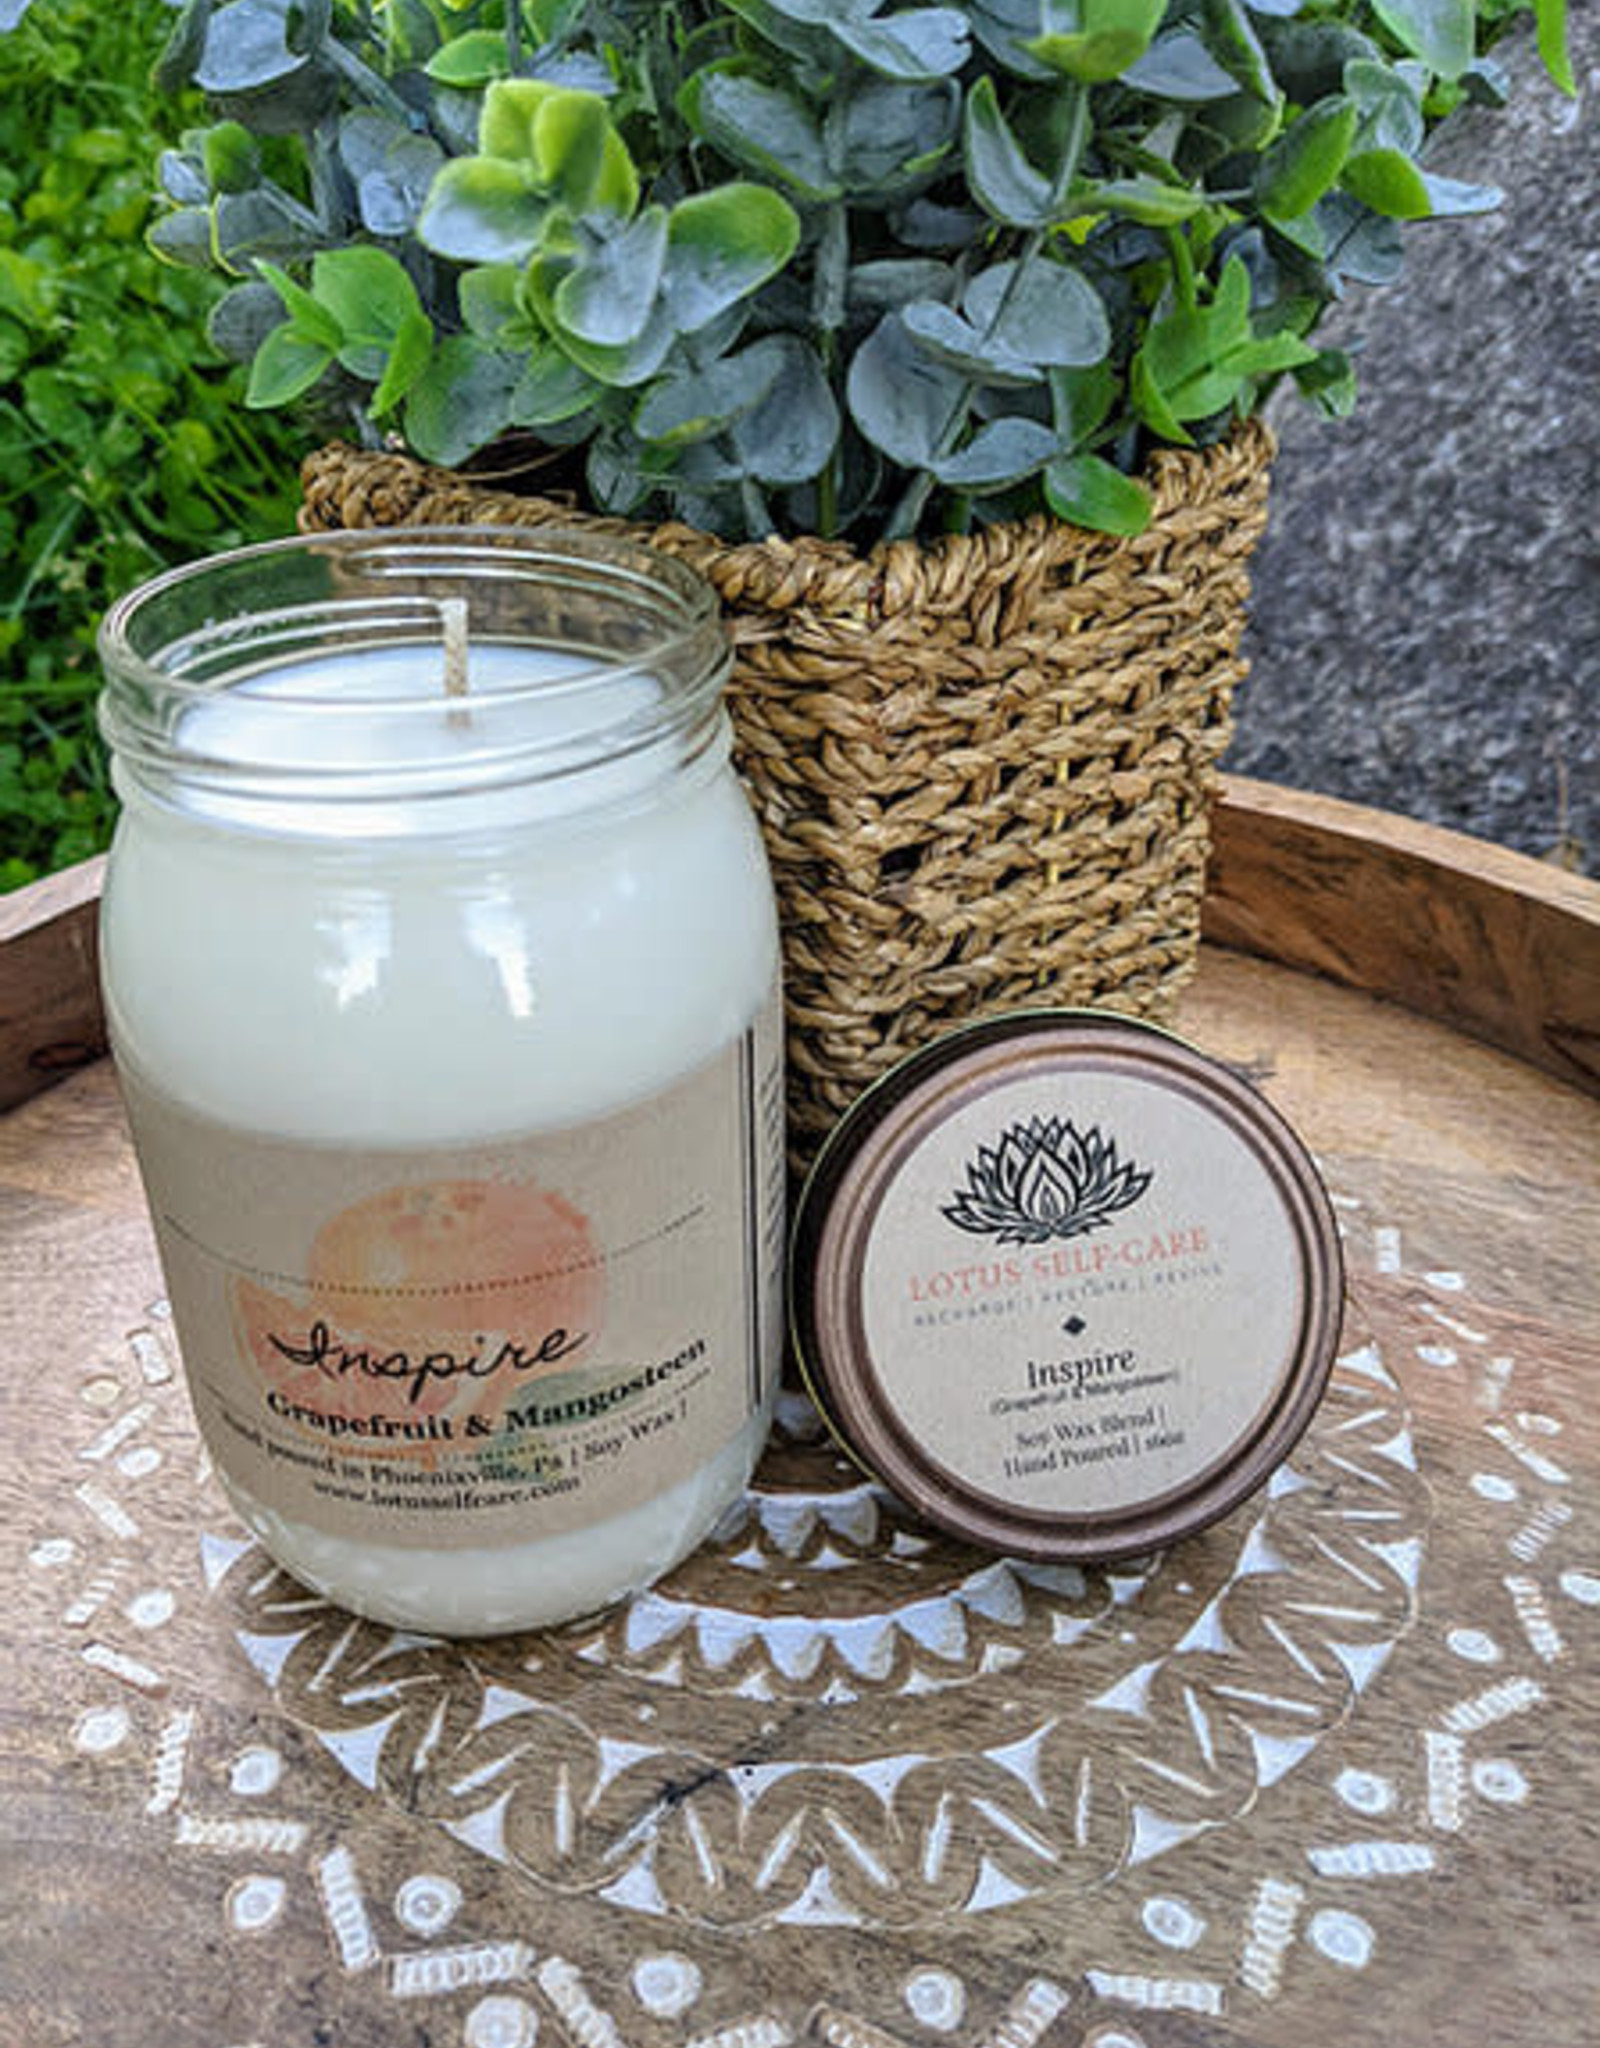 Lotus Self-Care Handmade Lotus Self-Care Large Jar Candle